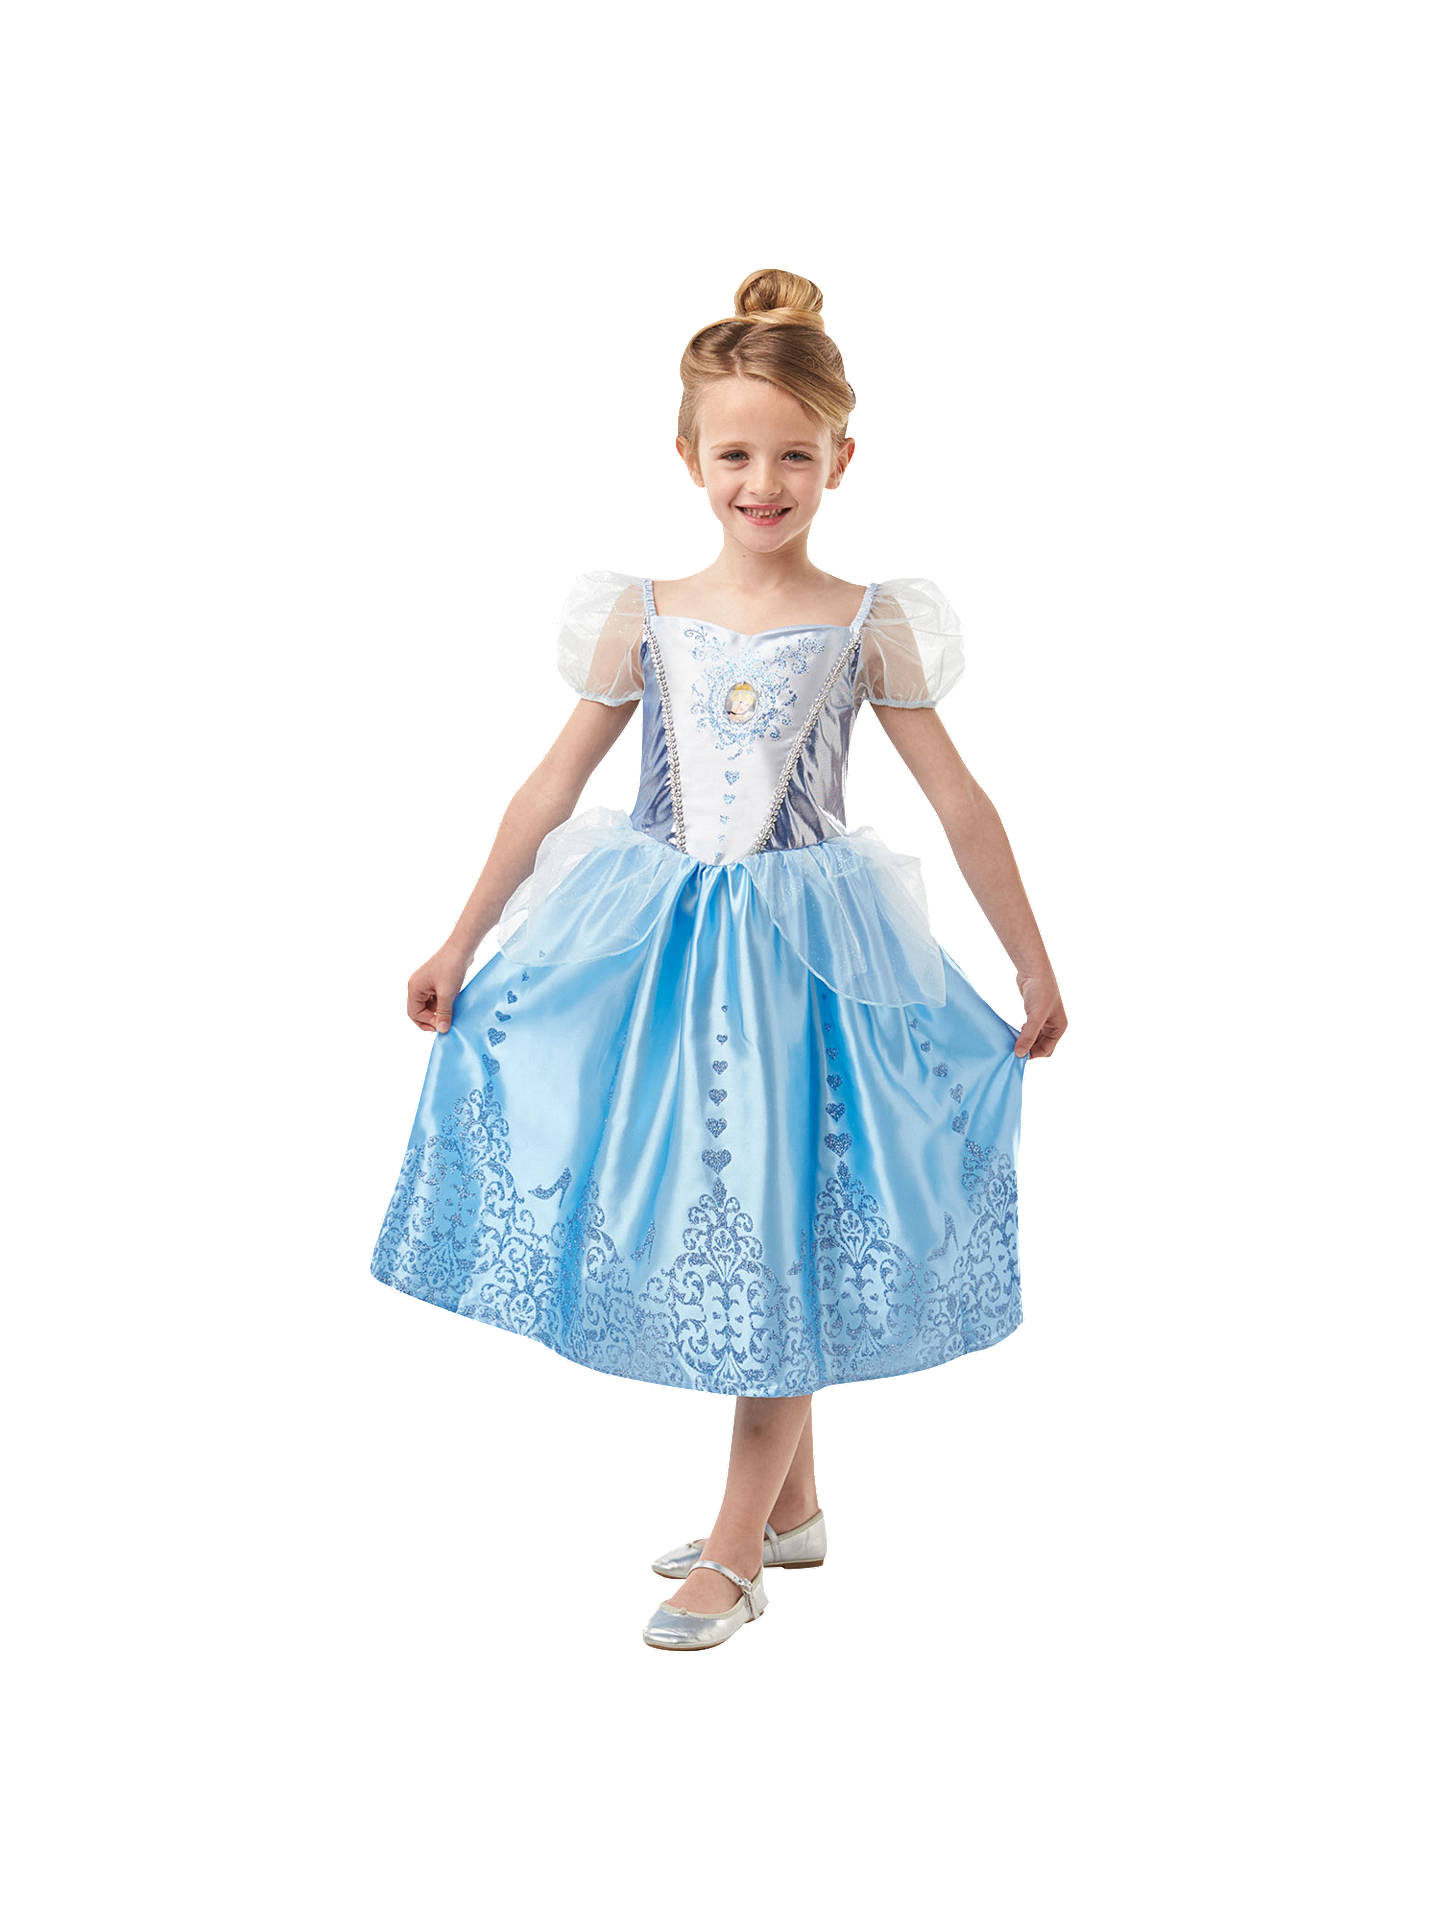 5f0833ff3f02 Buy Disney Princess Cinderella Children s Costume